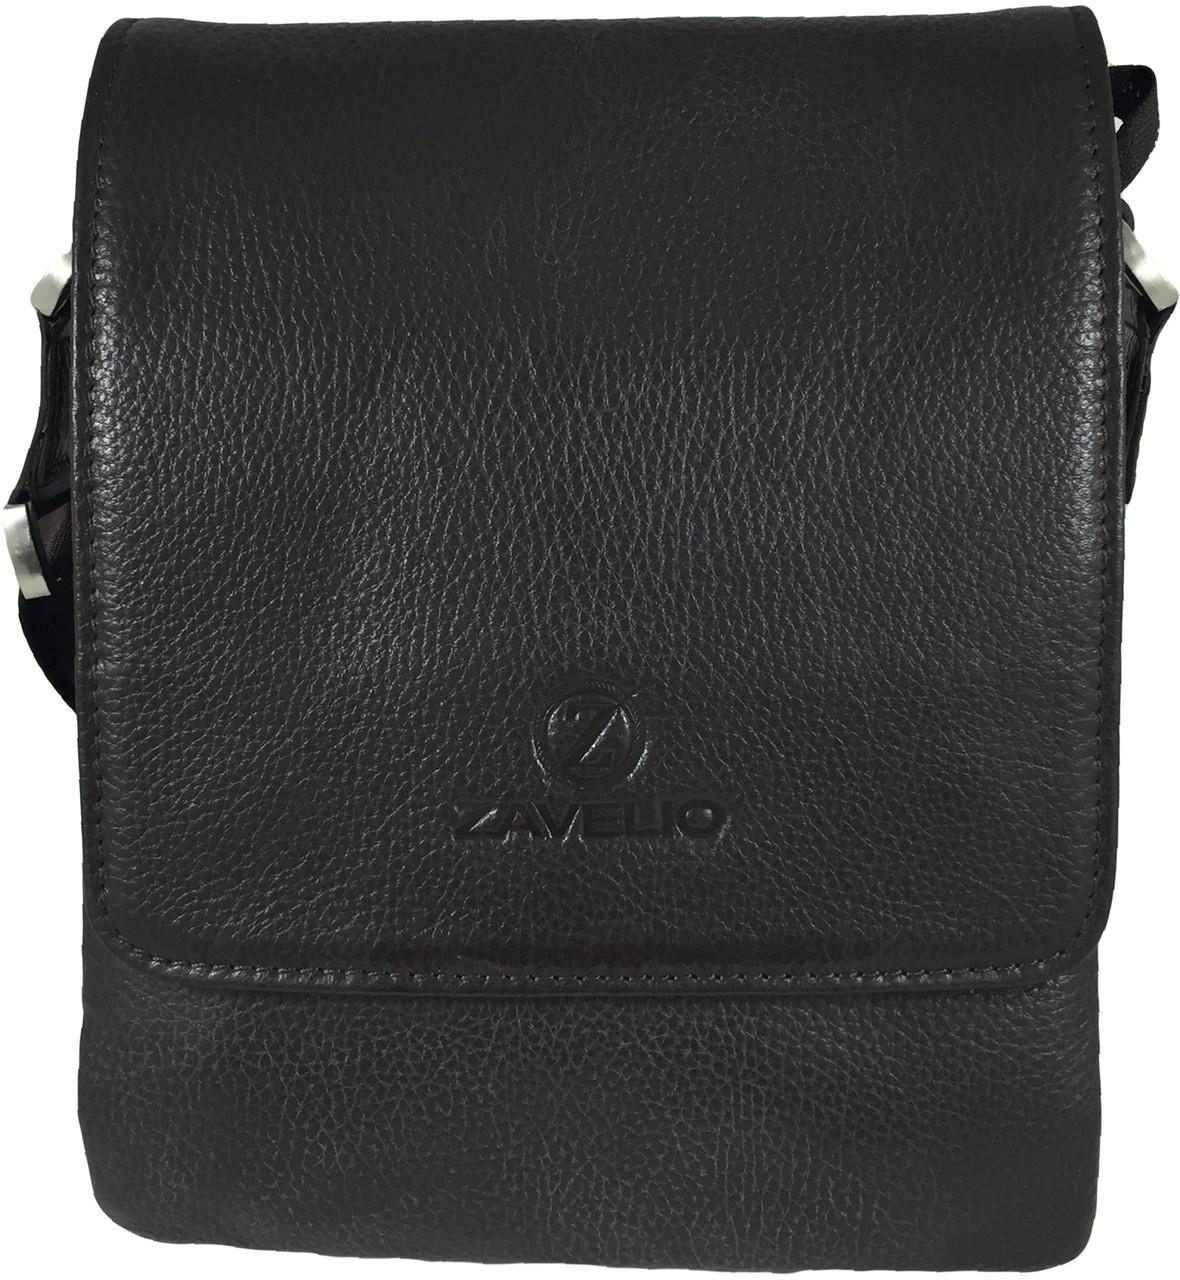 Men s Genuine Leather Small Cross Body Shoulder Messenger Bag - Brown 1.  Loading zoom 6315048a8e